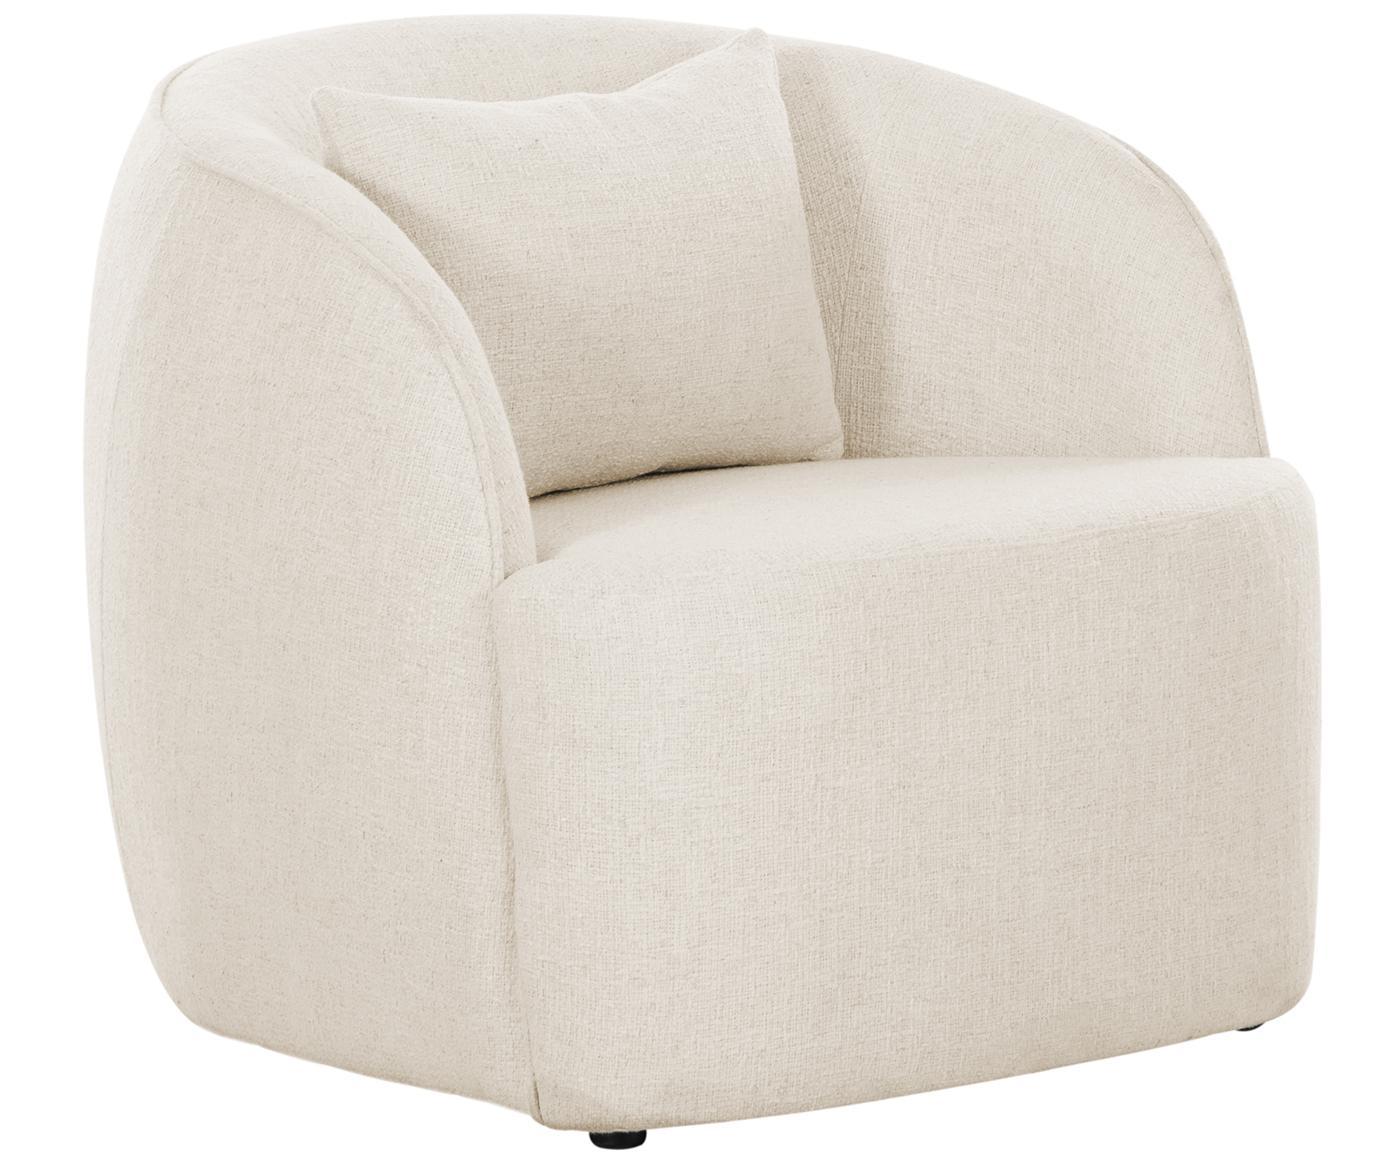 Bouclé fauteuil Elodie, Bekleding: bouclé (70% polyester, 20, Frame: massief berkenhout, metaa, Poten: kunststof, Crèmewit, B 86 x D 62 cm